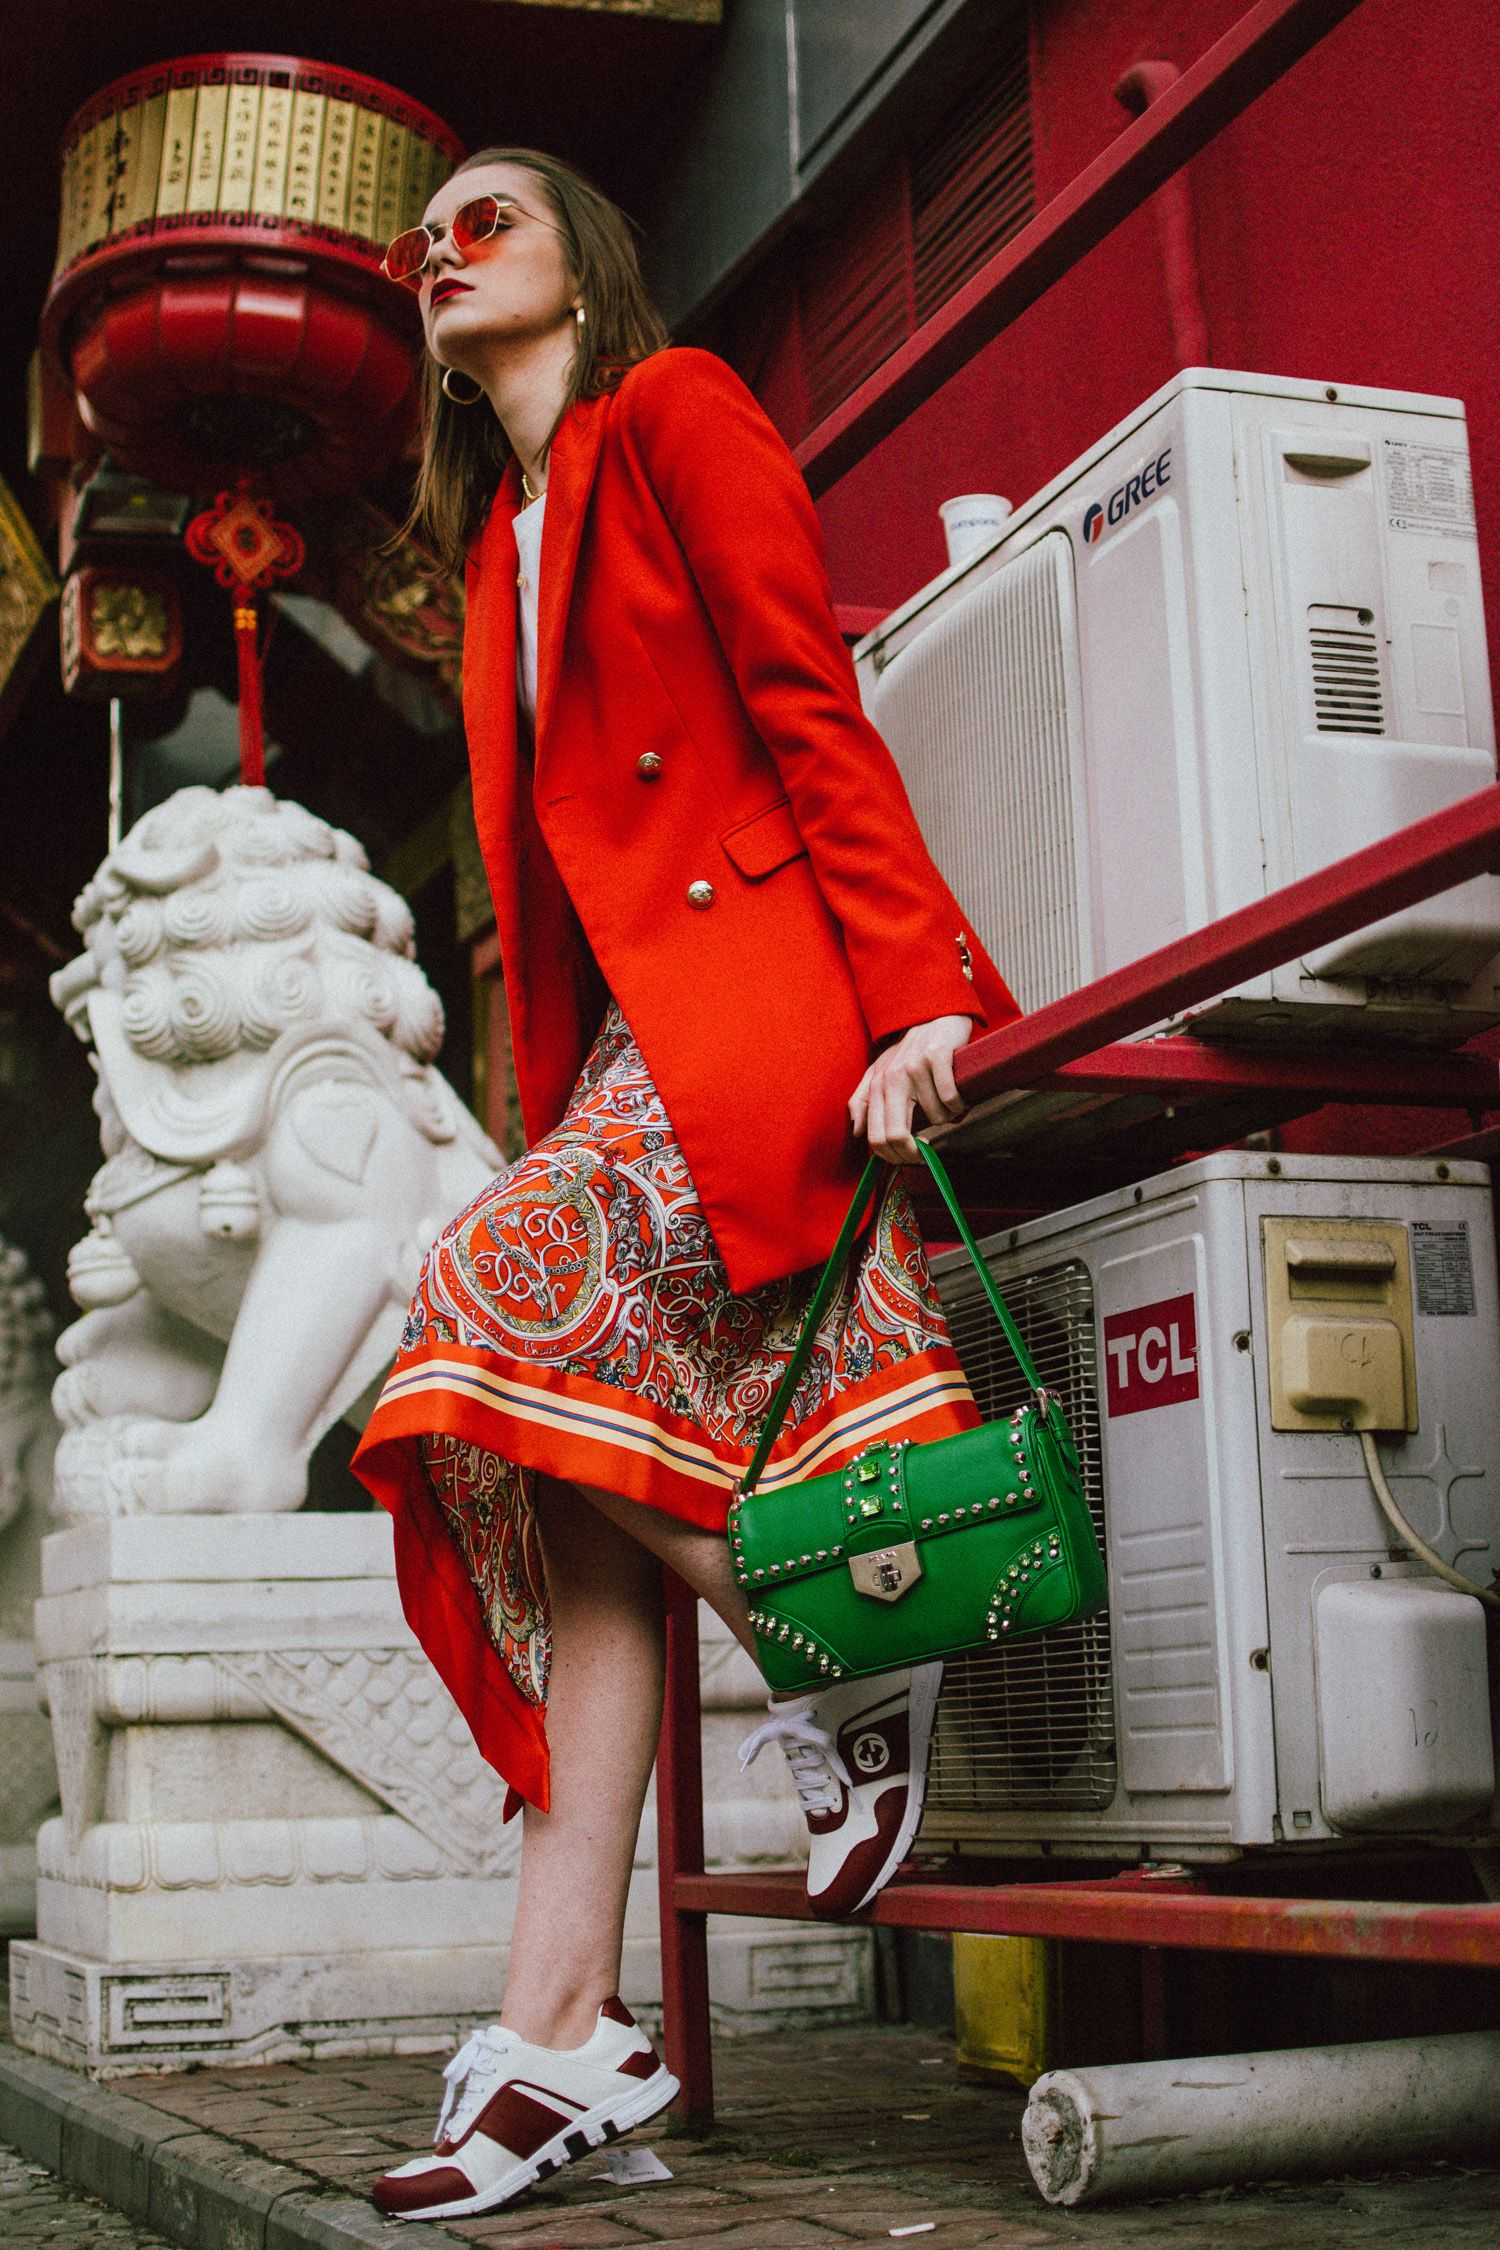 ee29fc421049 Zara double breasted long orange blazer, h&m patterned orange asymmetric midi  skirt, gucci white